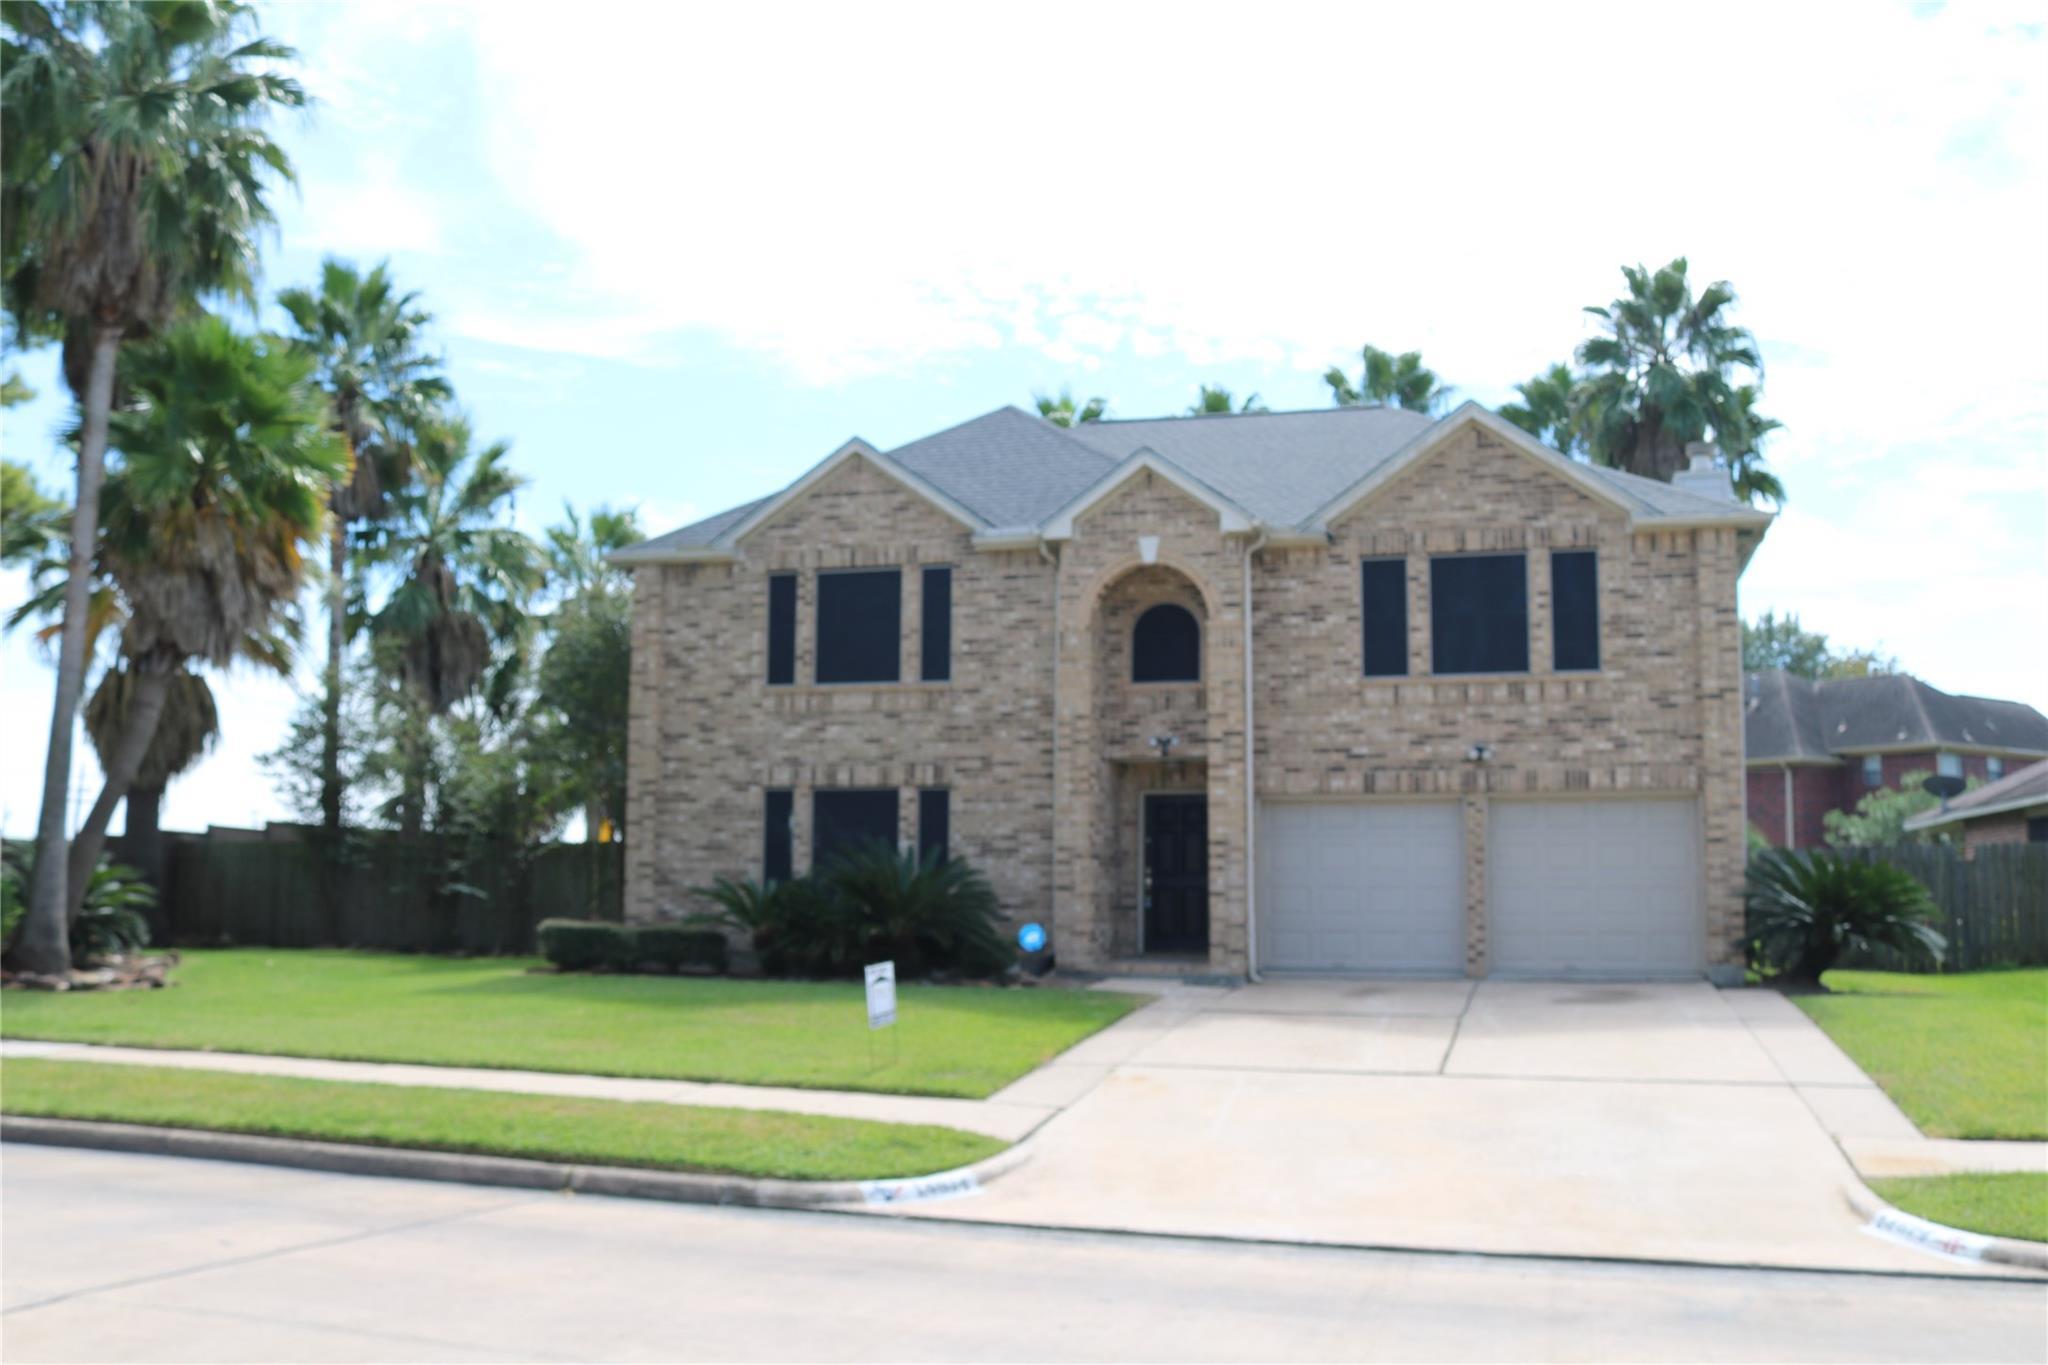 14614 Lansing Crest Drive Property Photo - Houston, TX real estate listing